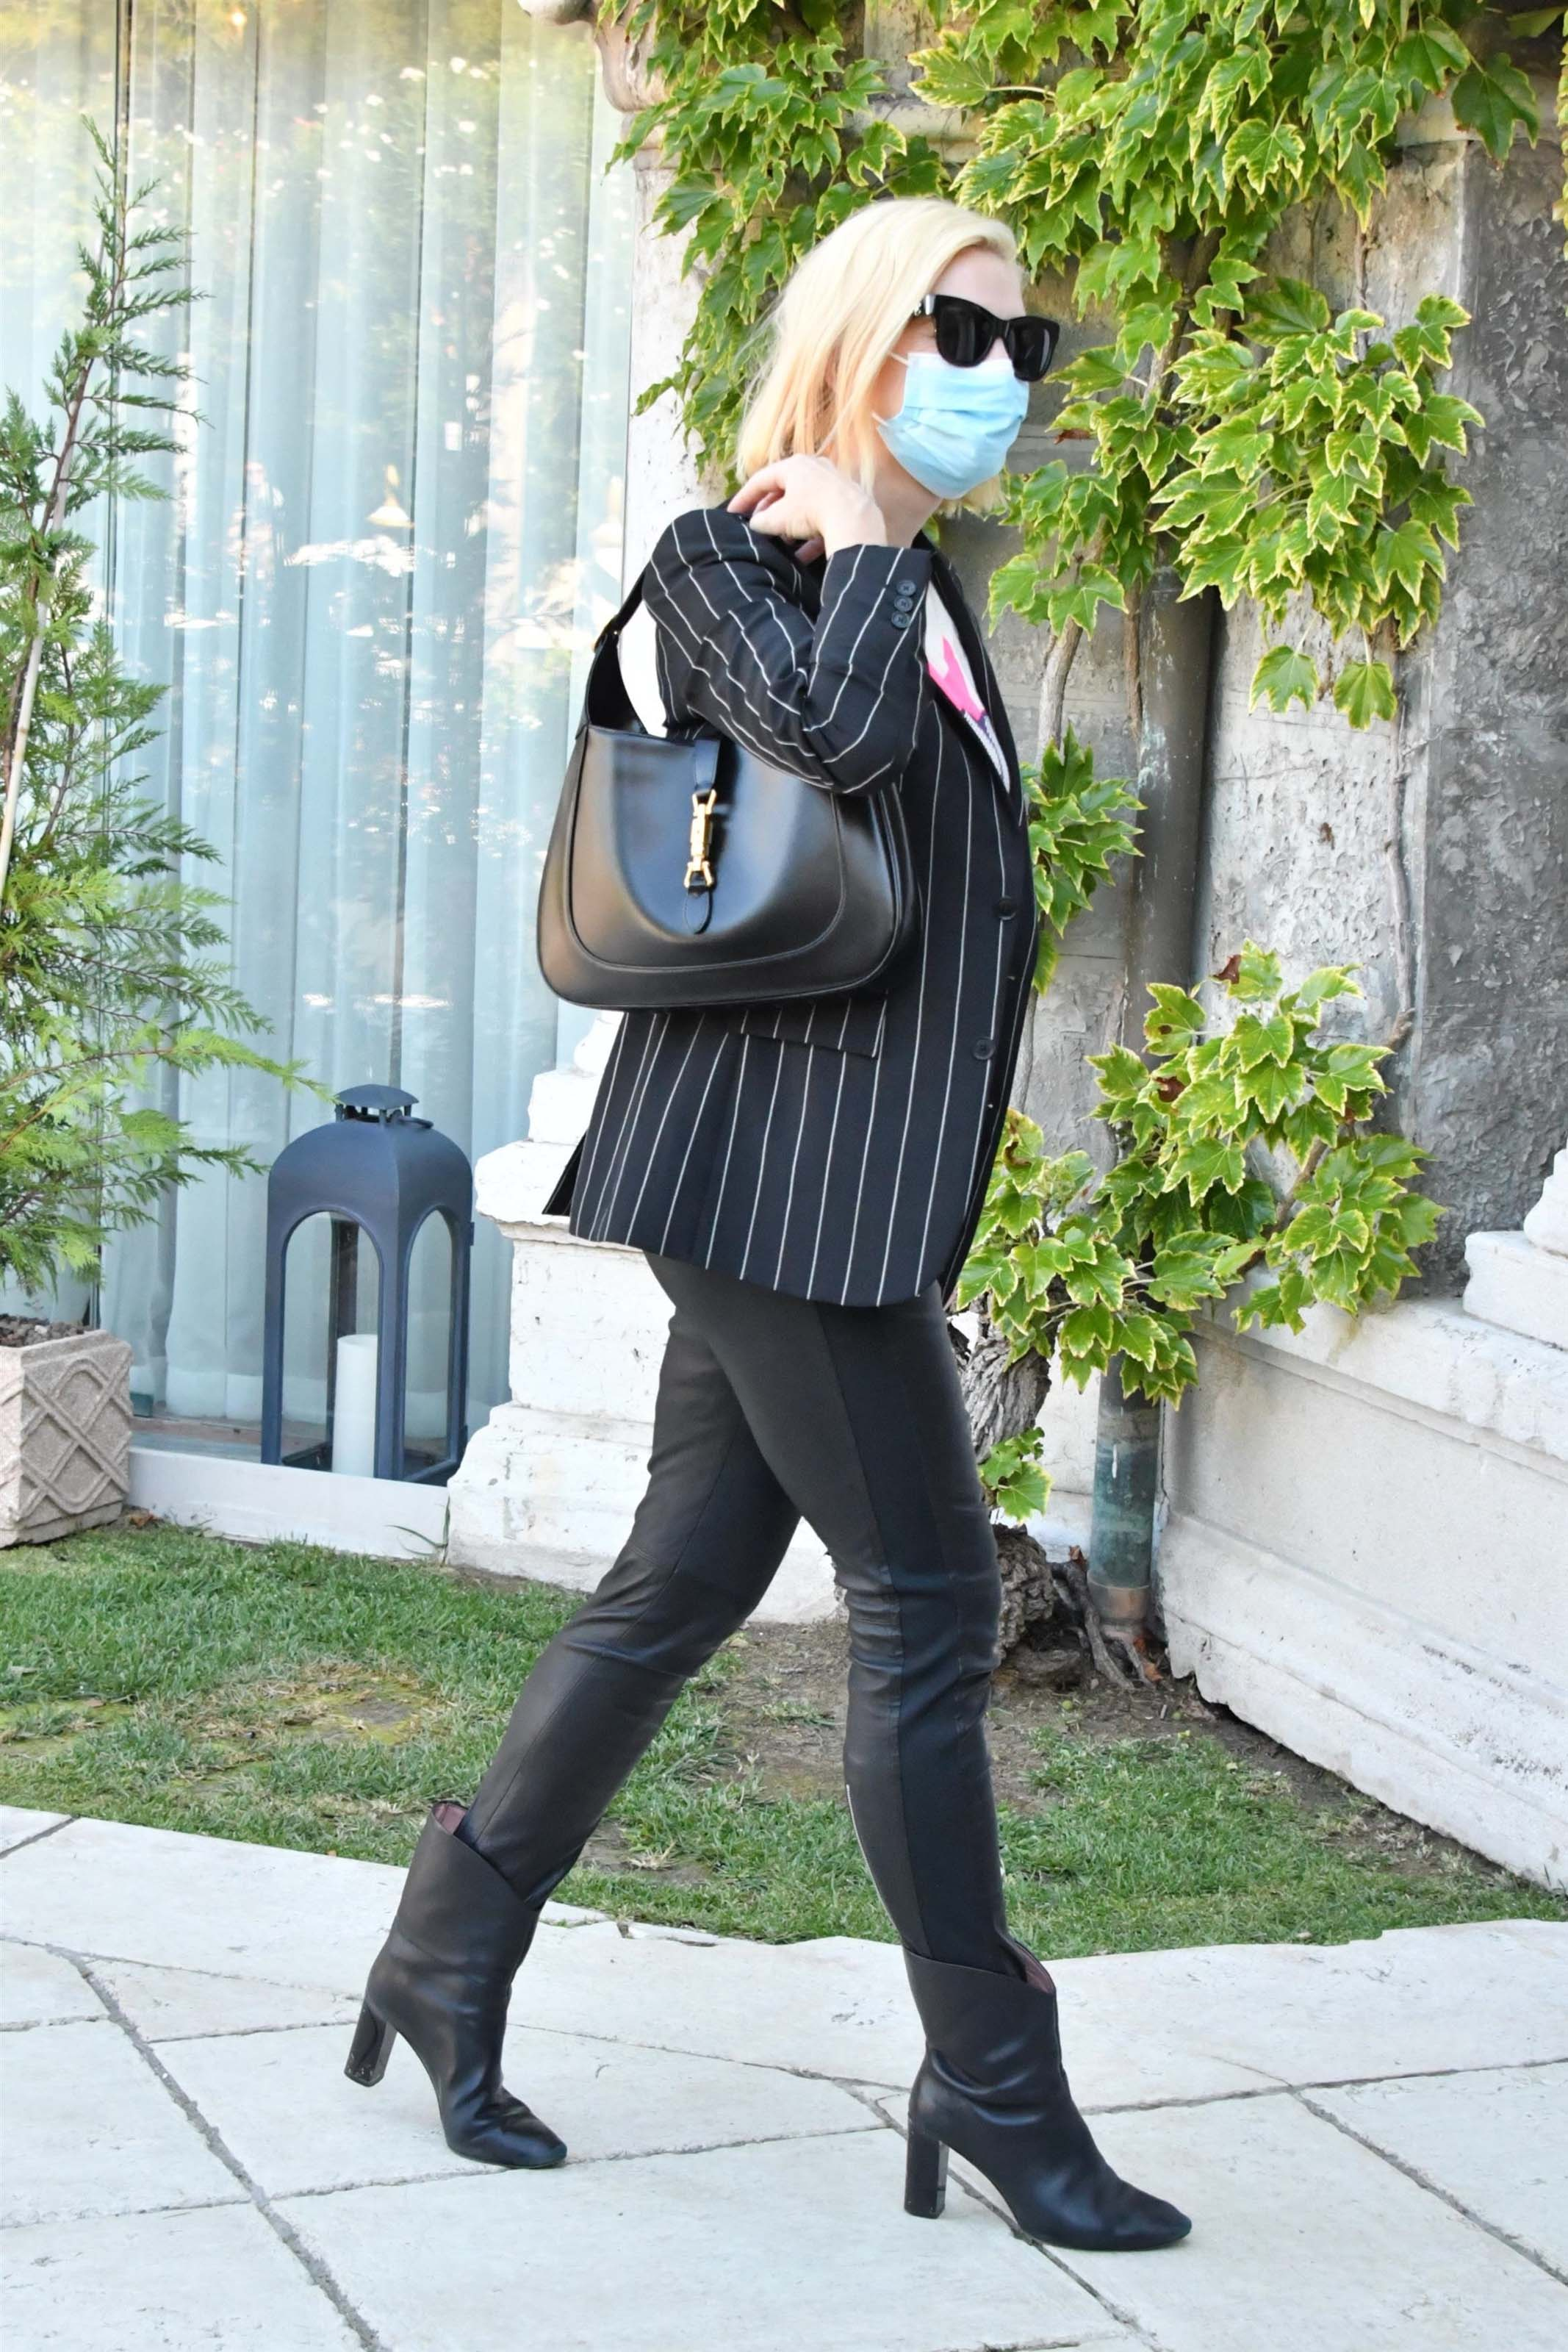 Cate Blanchett at 77th Venice Film Festival